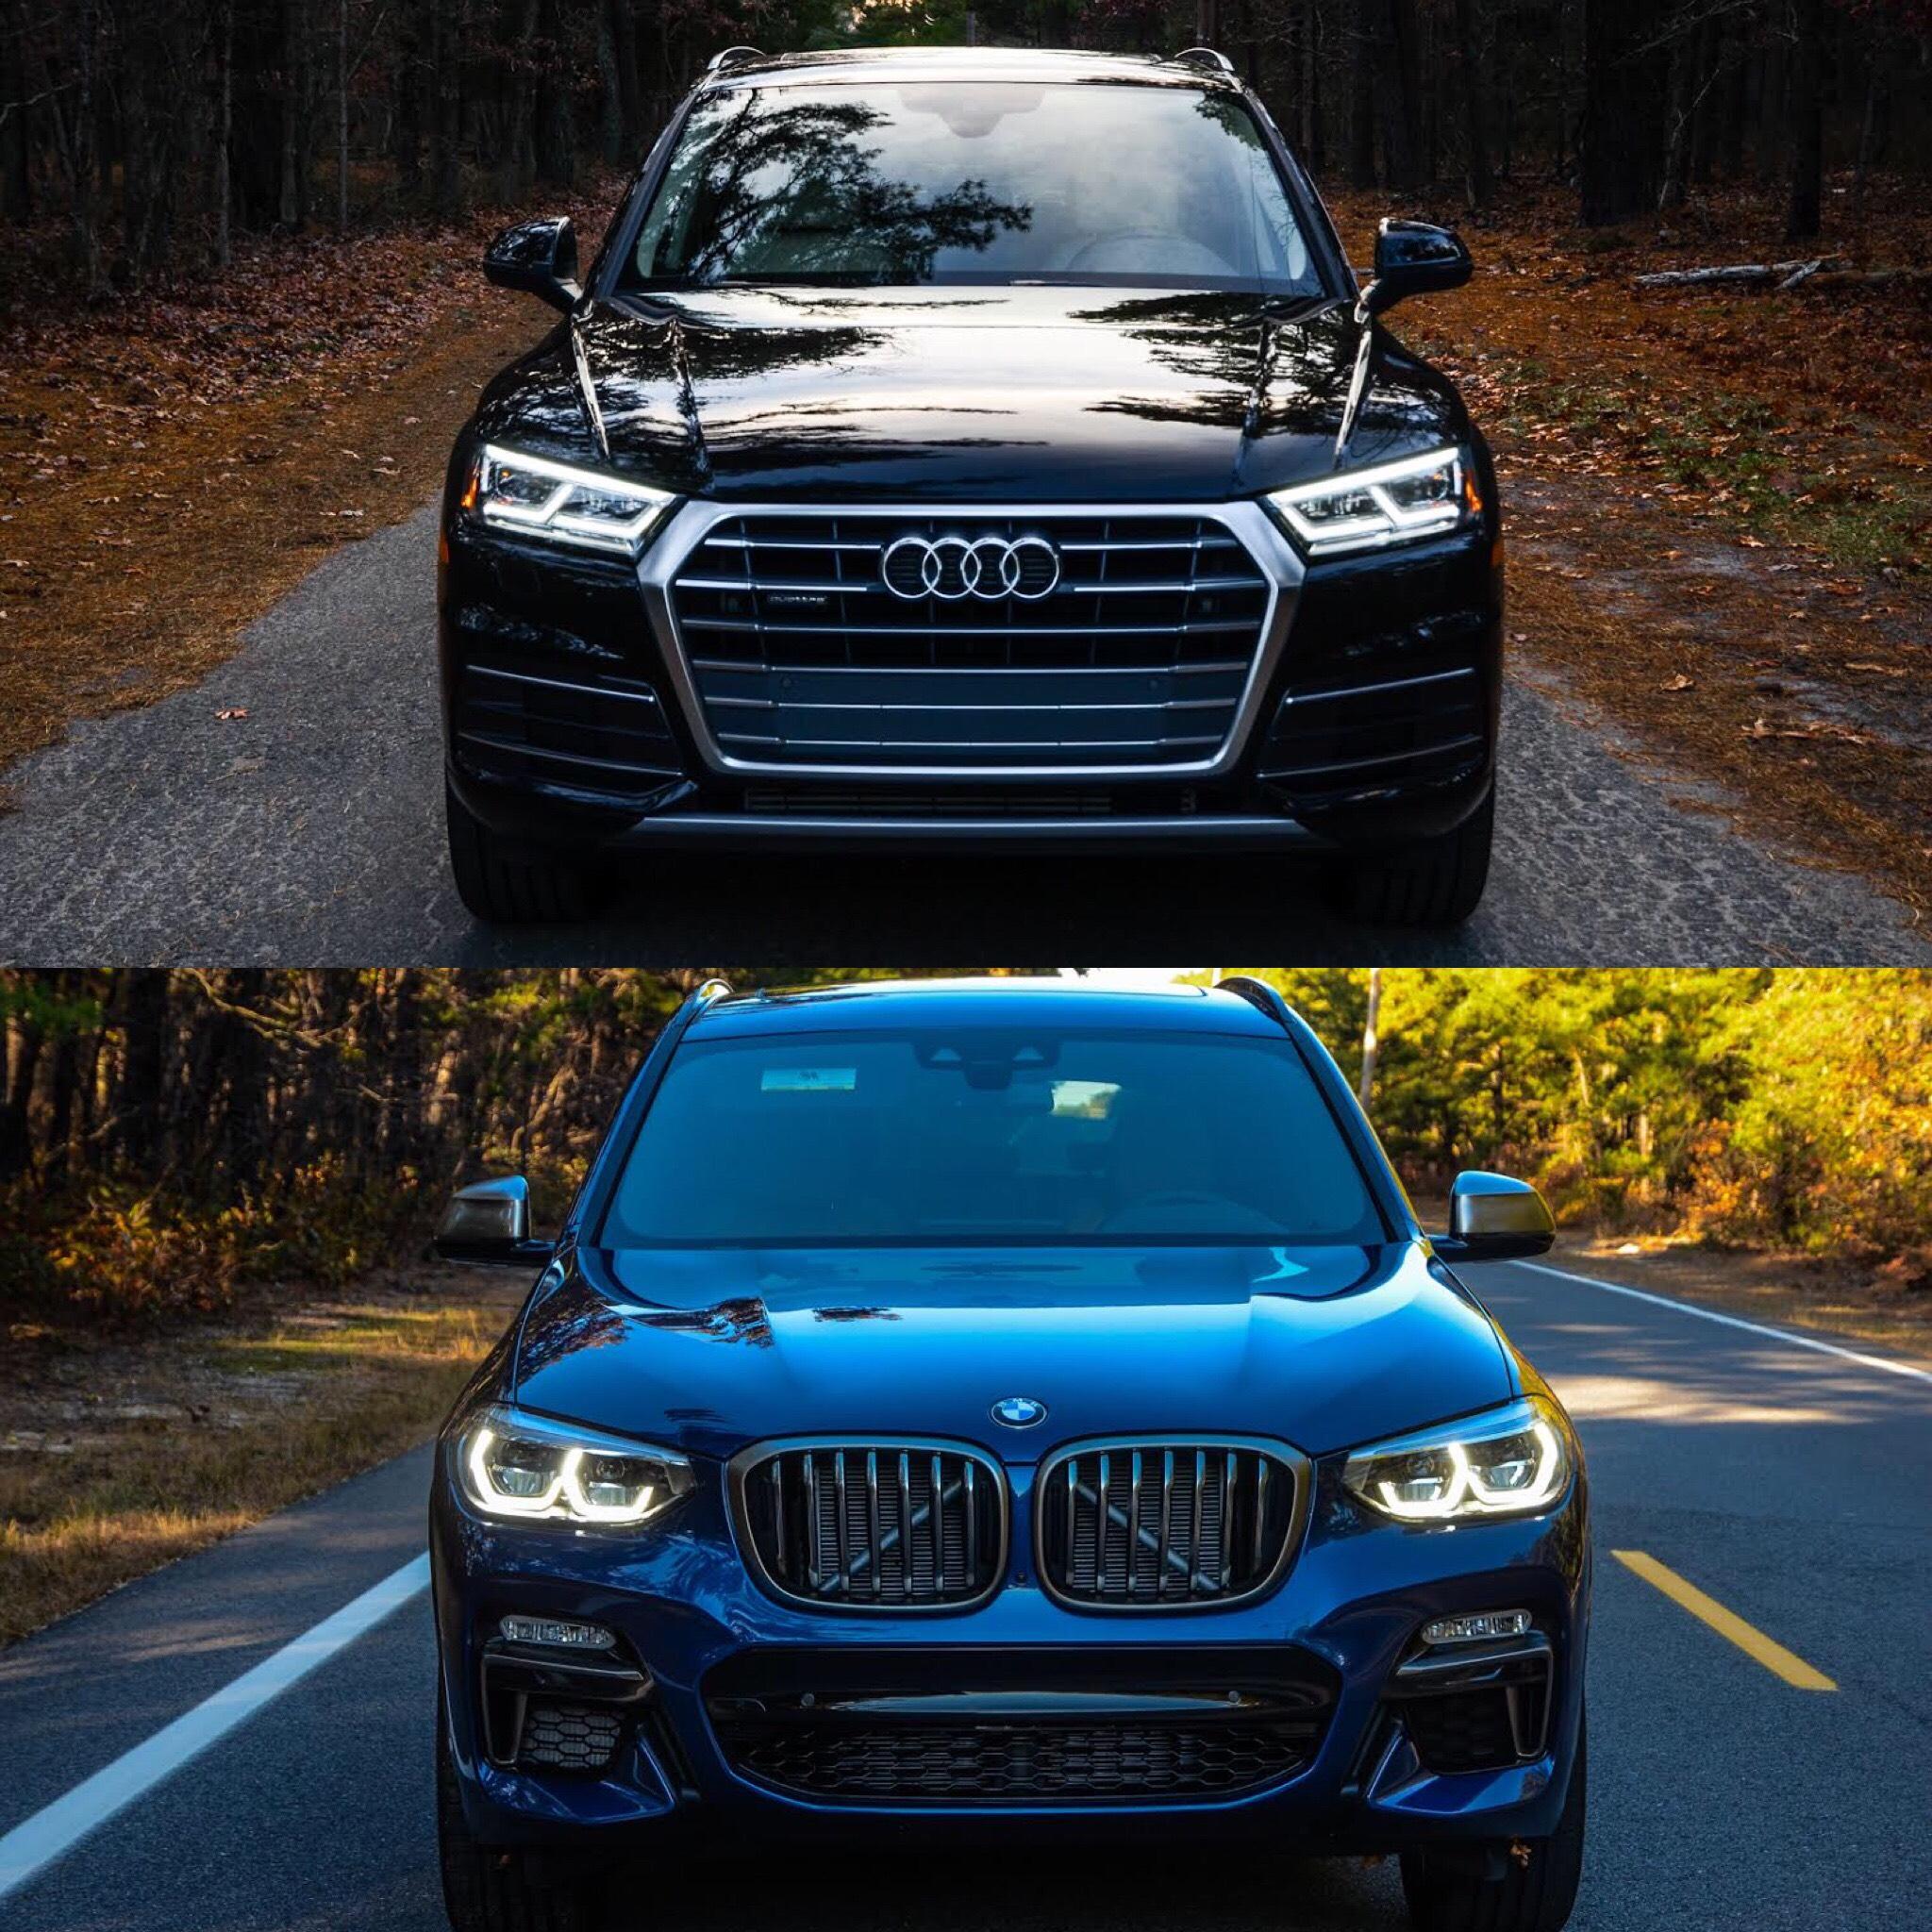 Photo Comparison: 2018 BMW X3 vs 2017 Audi Q5